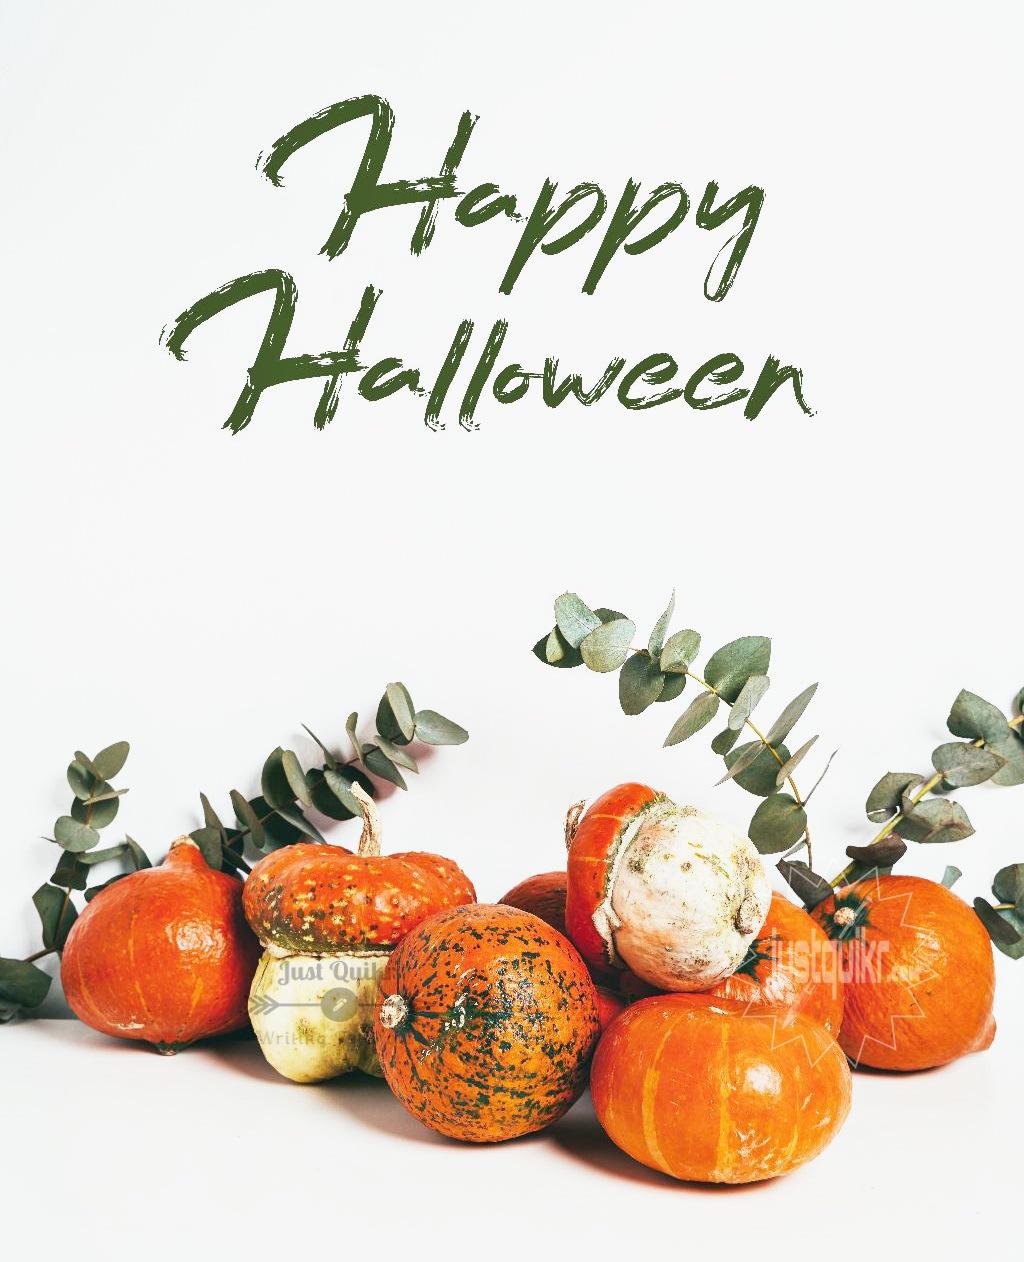 Halloween Day Essay in English